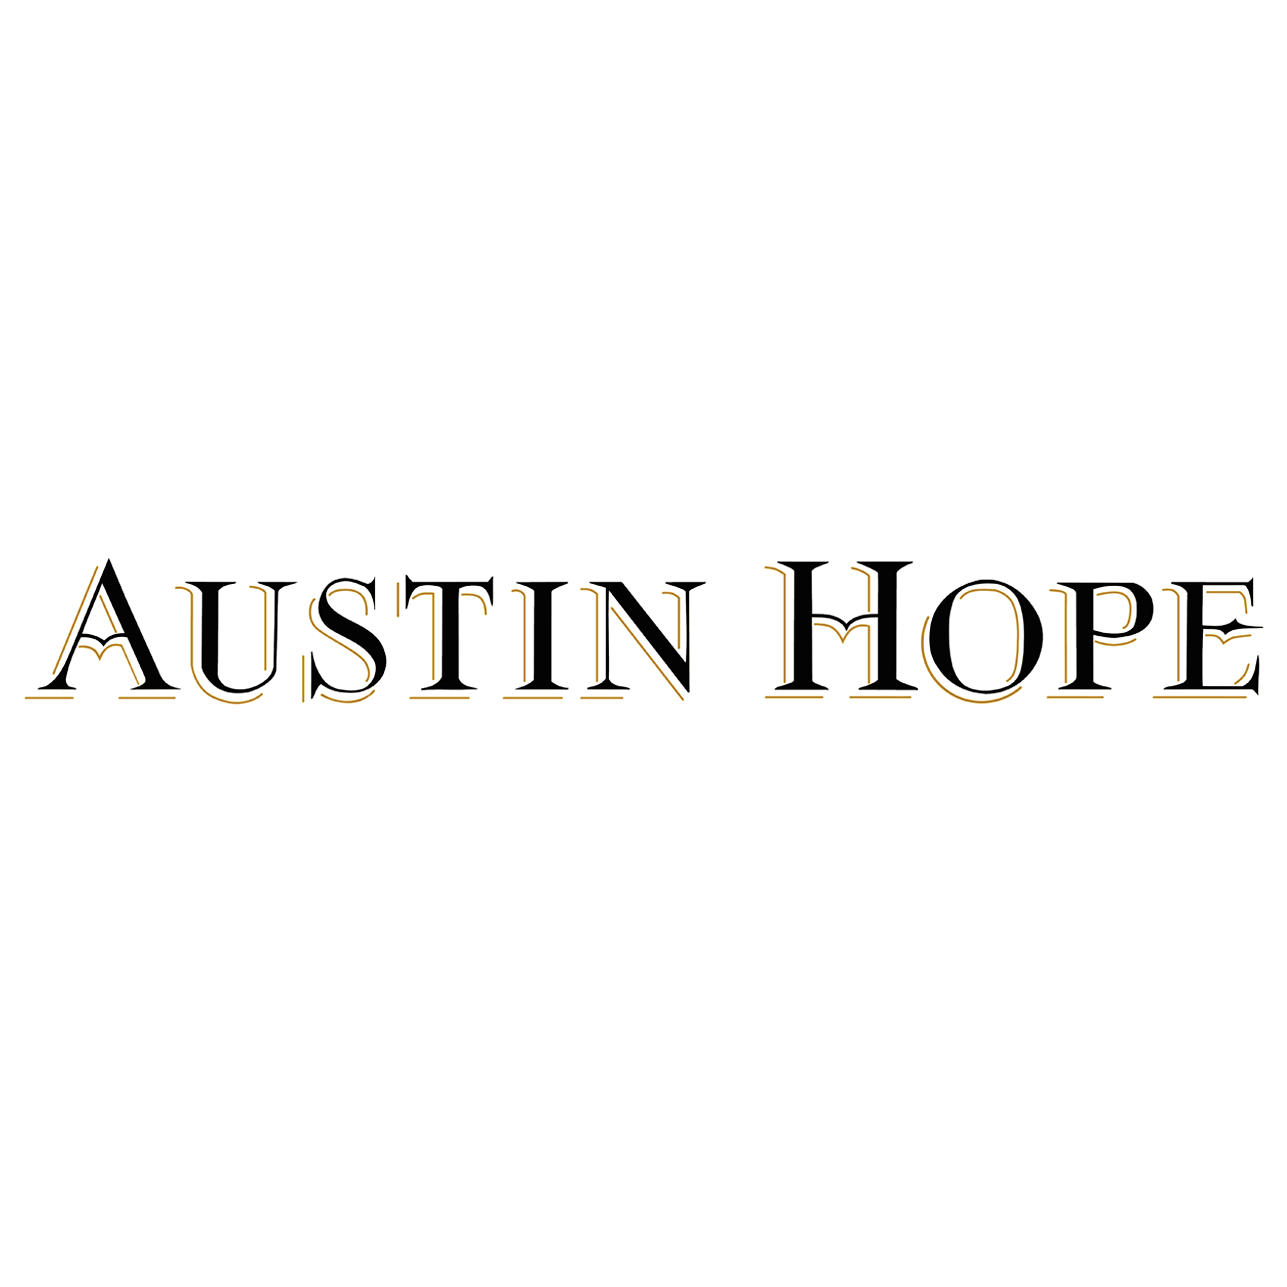 AustinHope.png